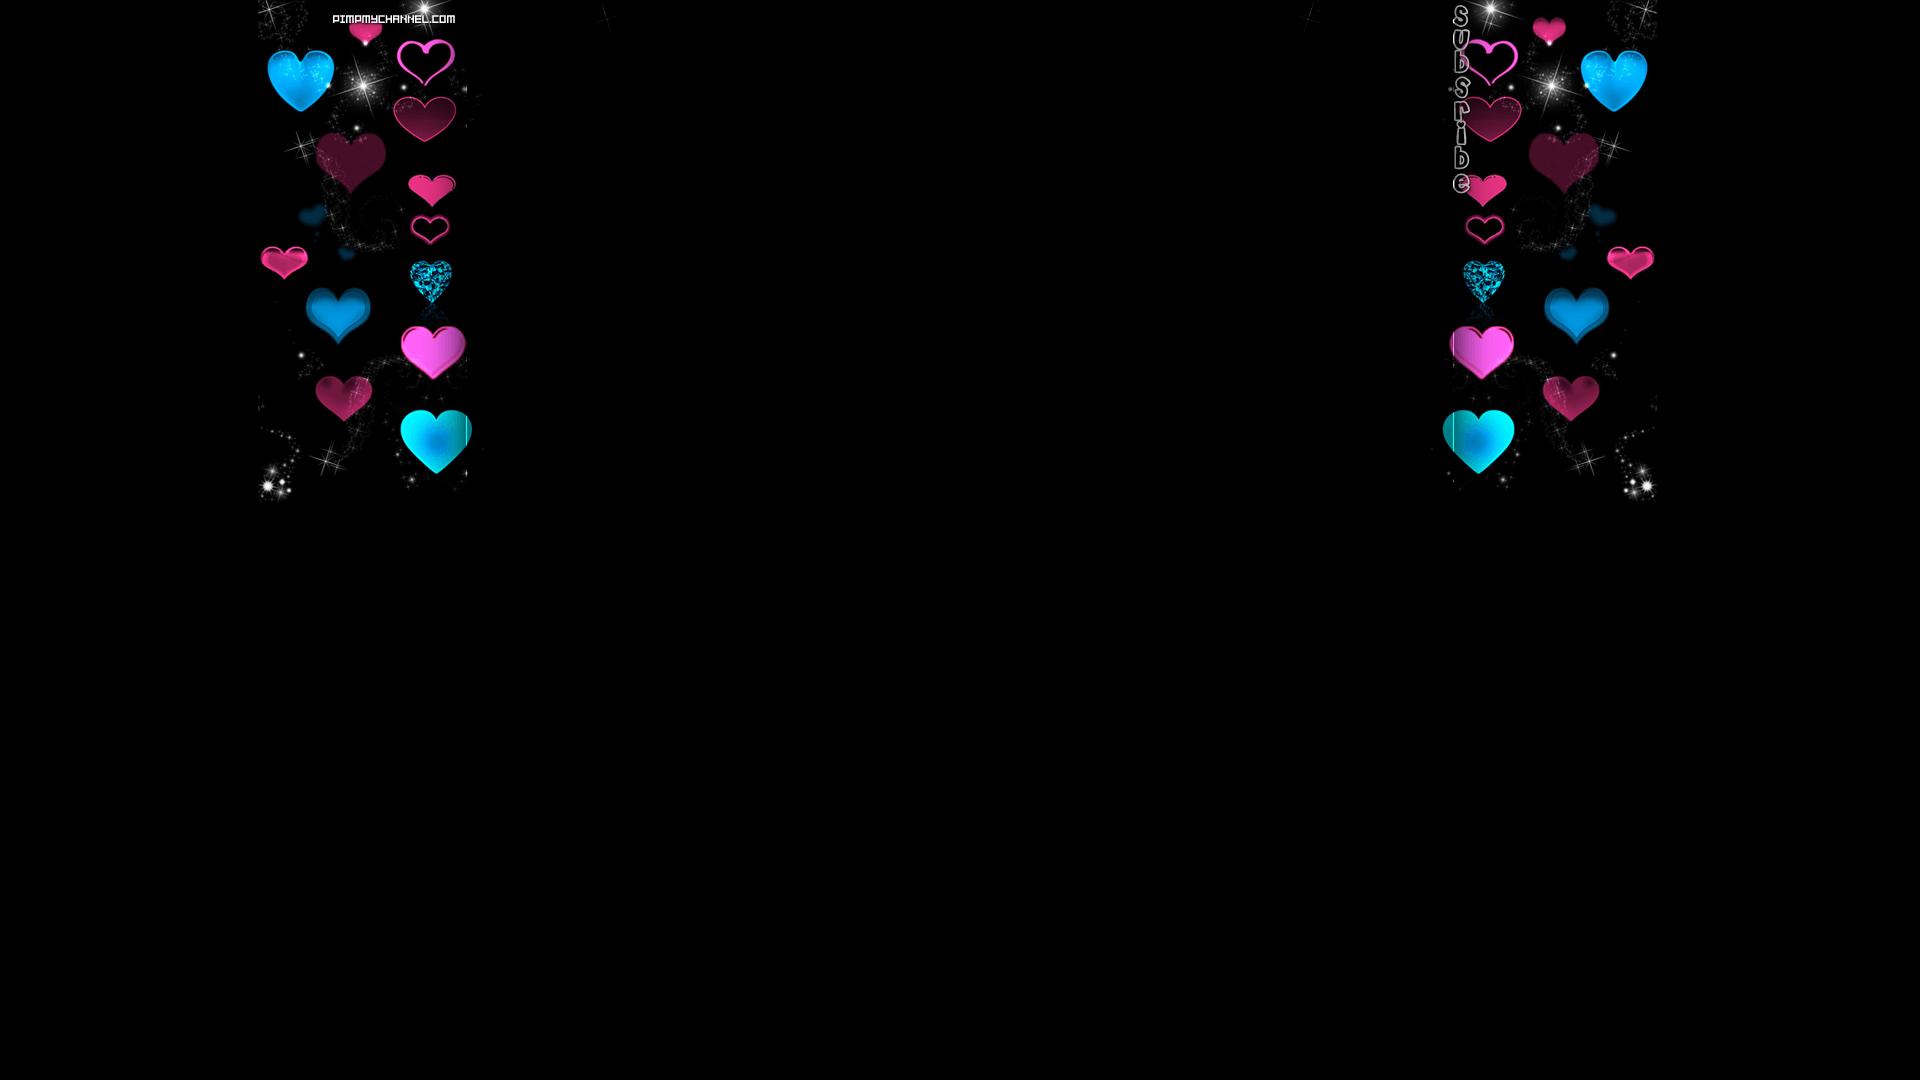 Cute Black Wallpapers Wallpaper Cave